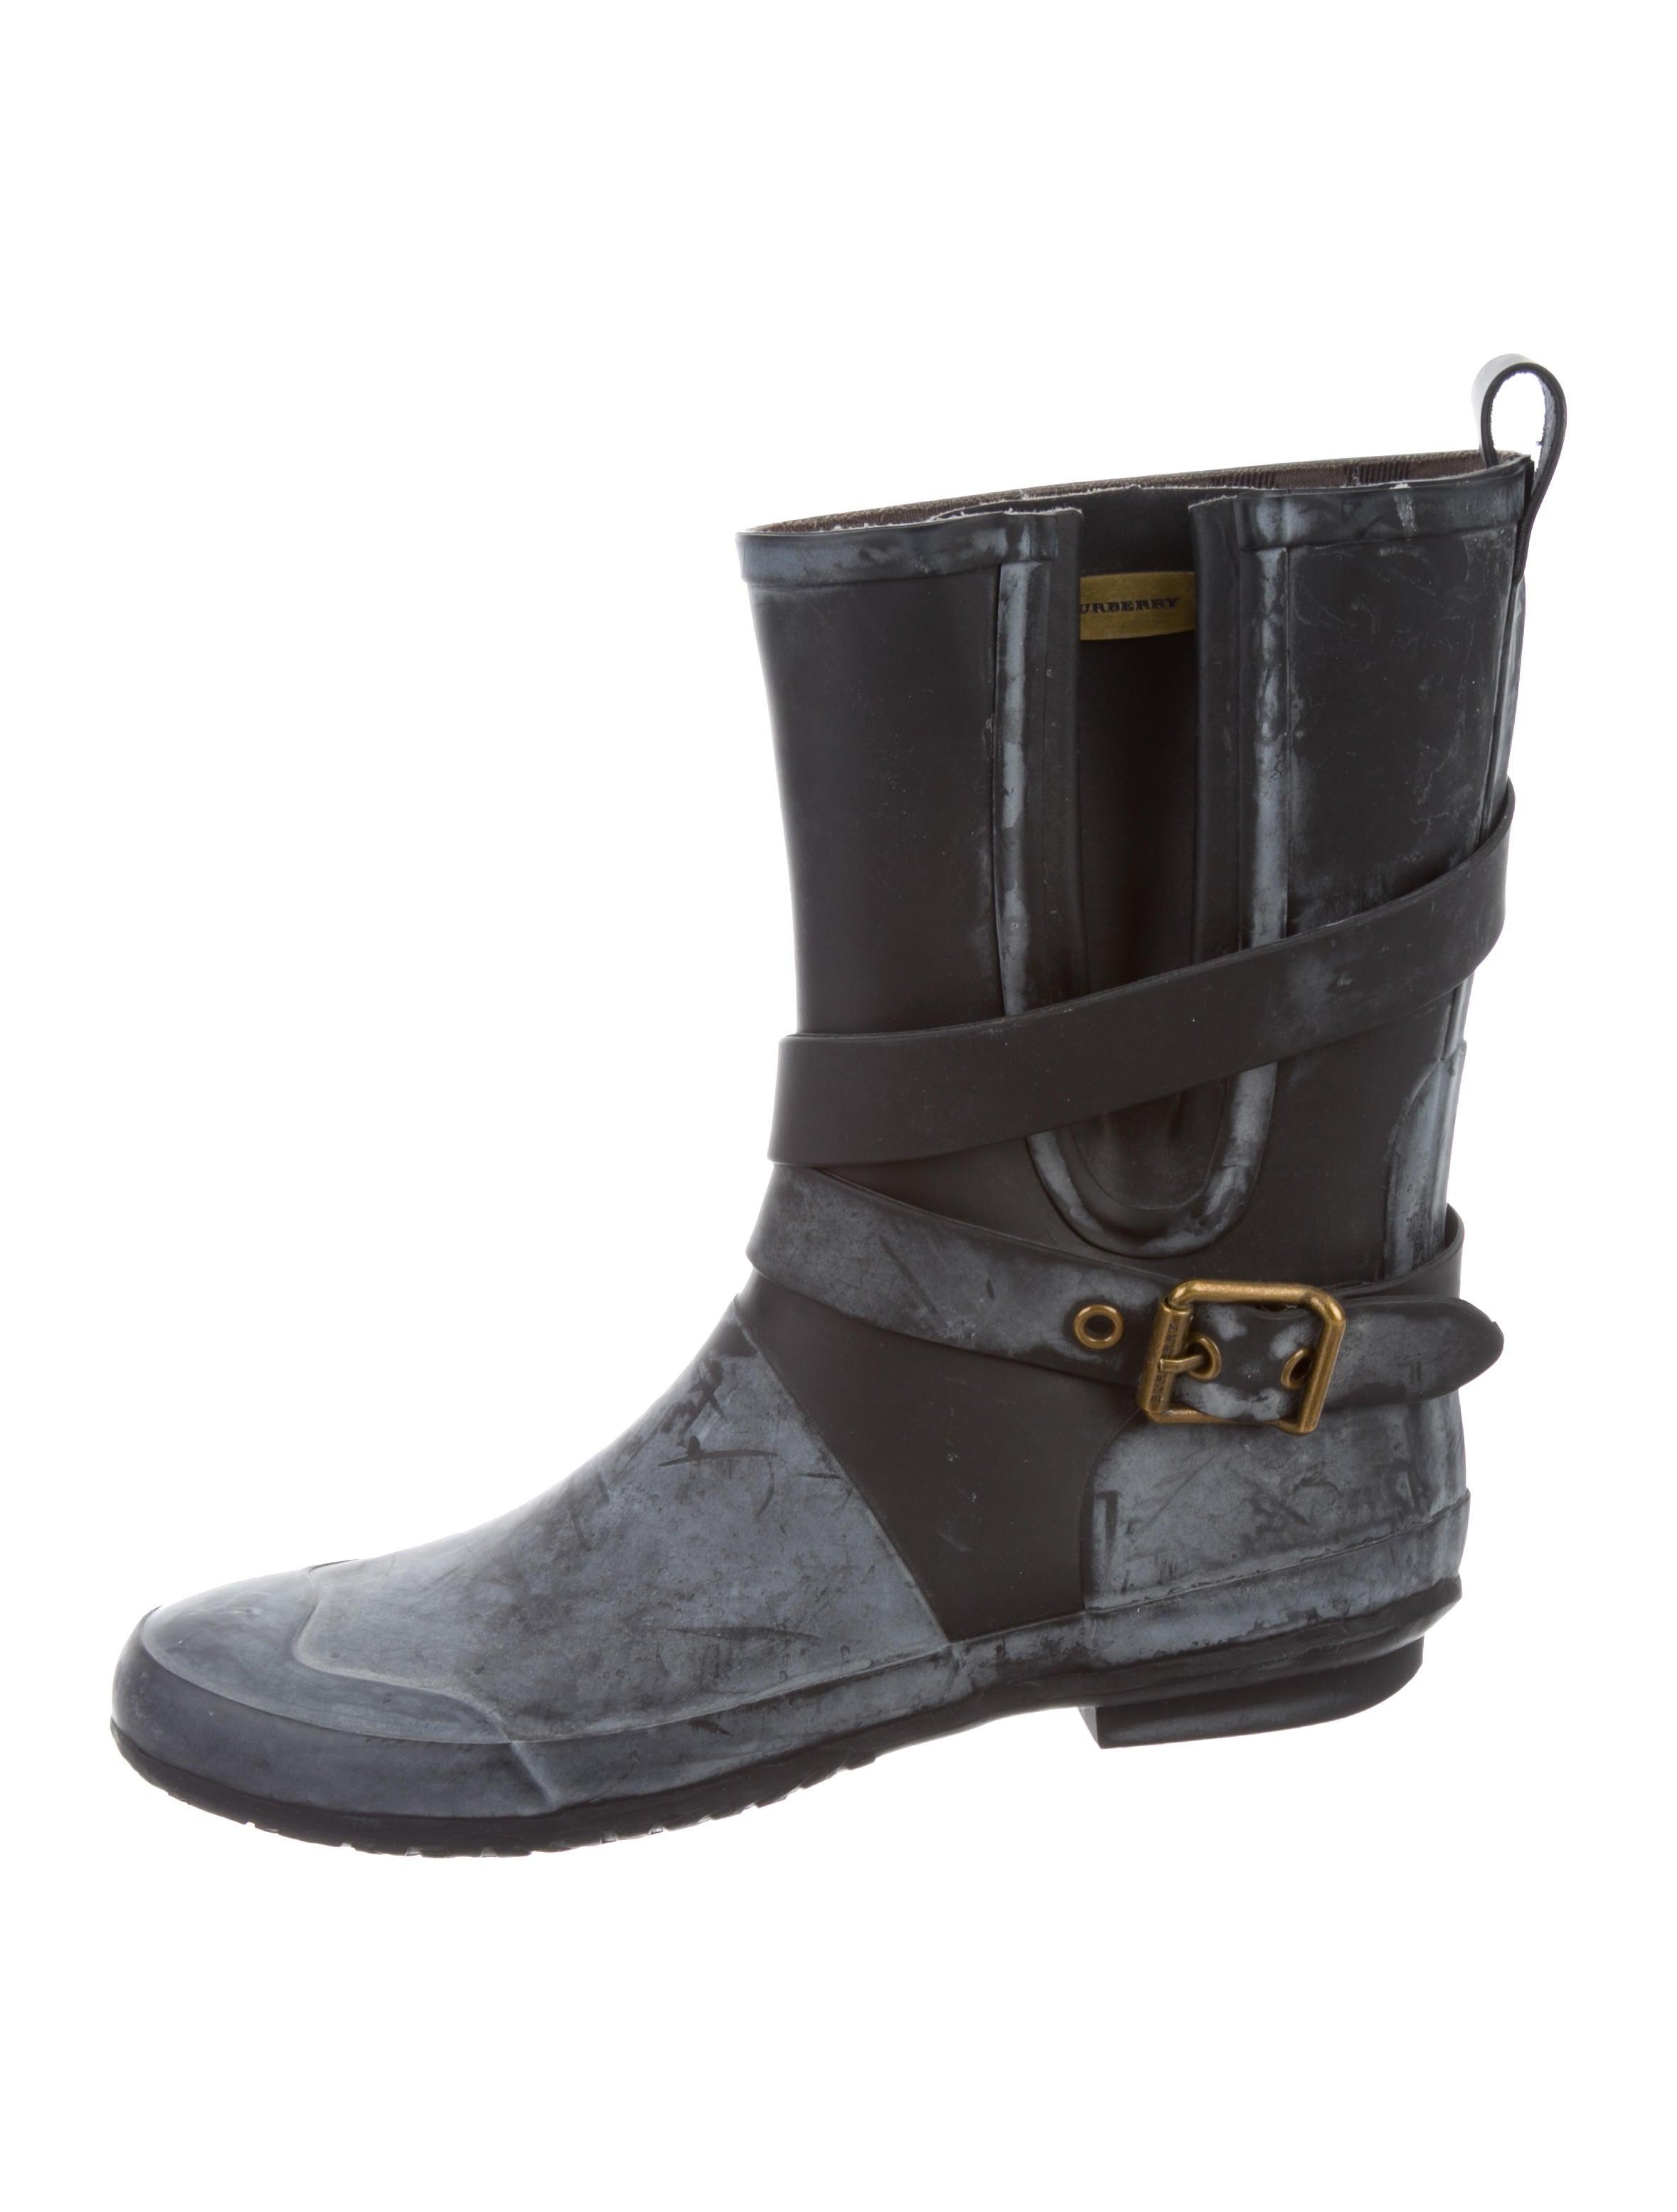 db6f972ea39 Burberry Rain Boots Sale